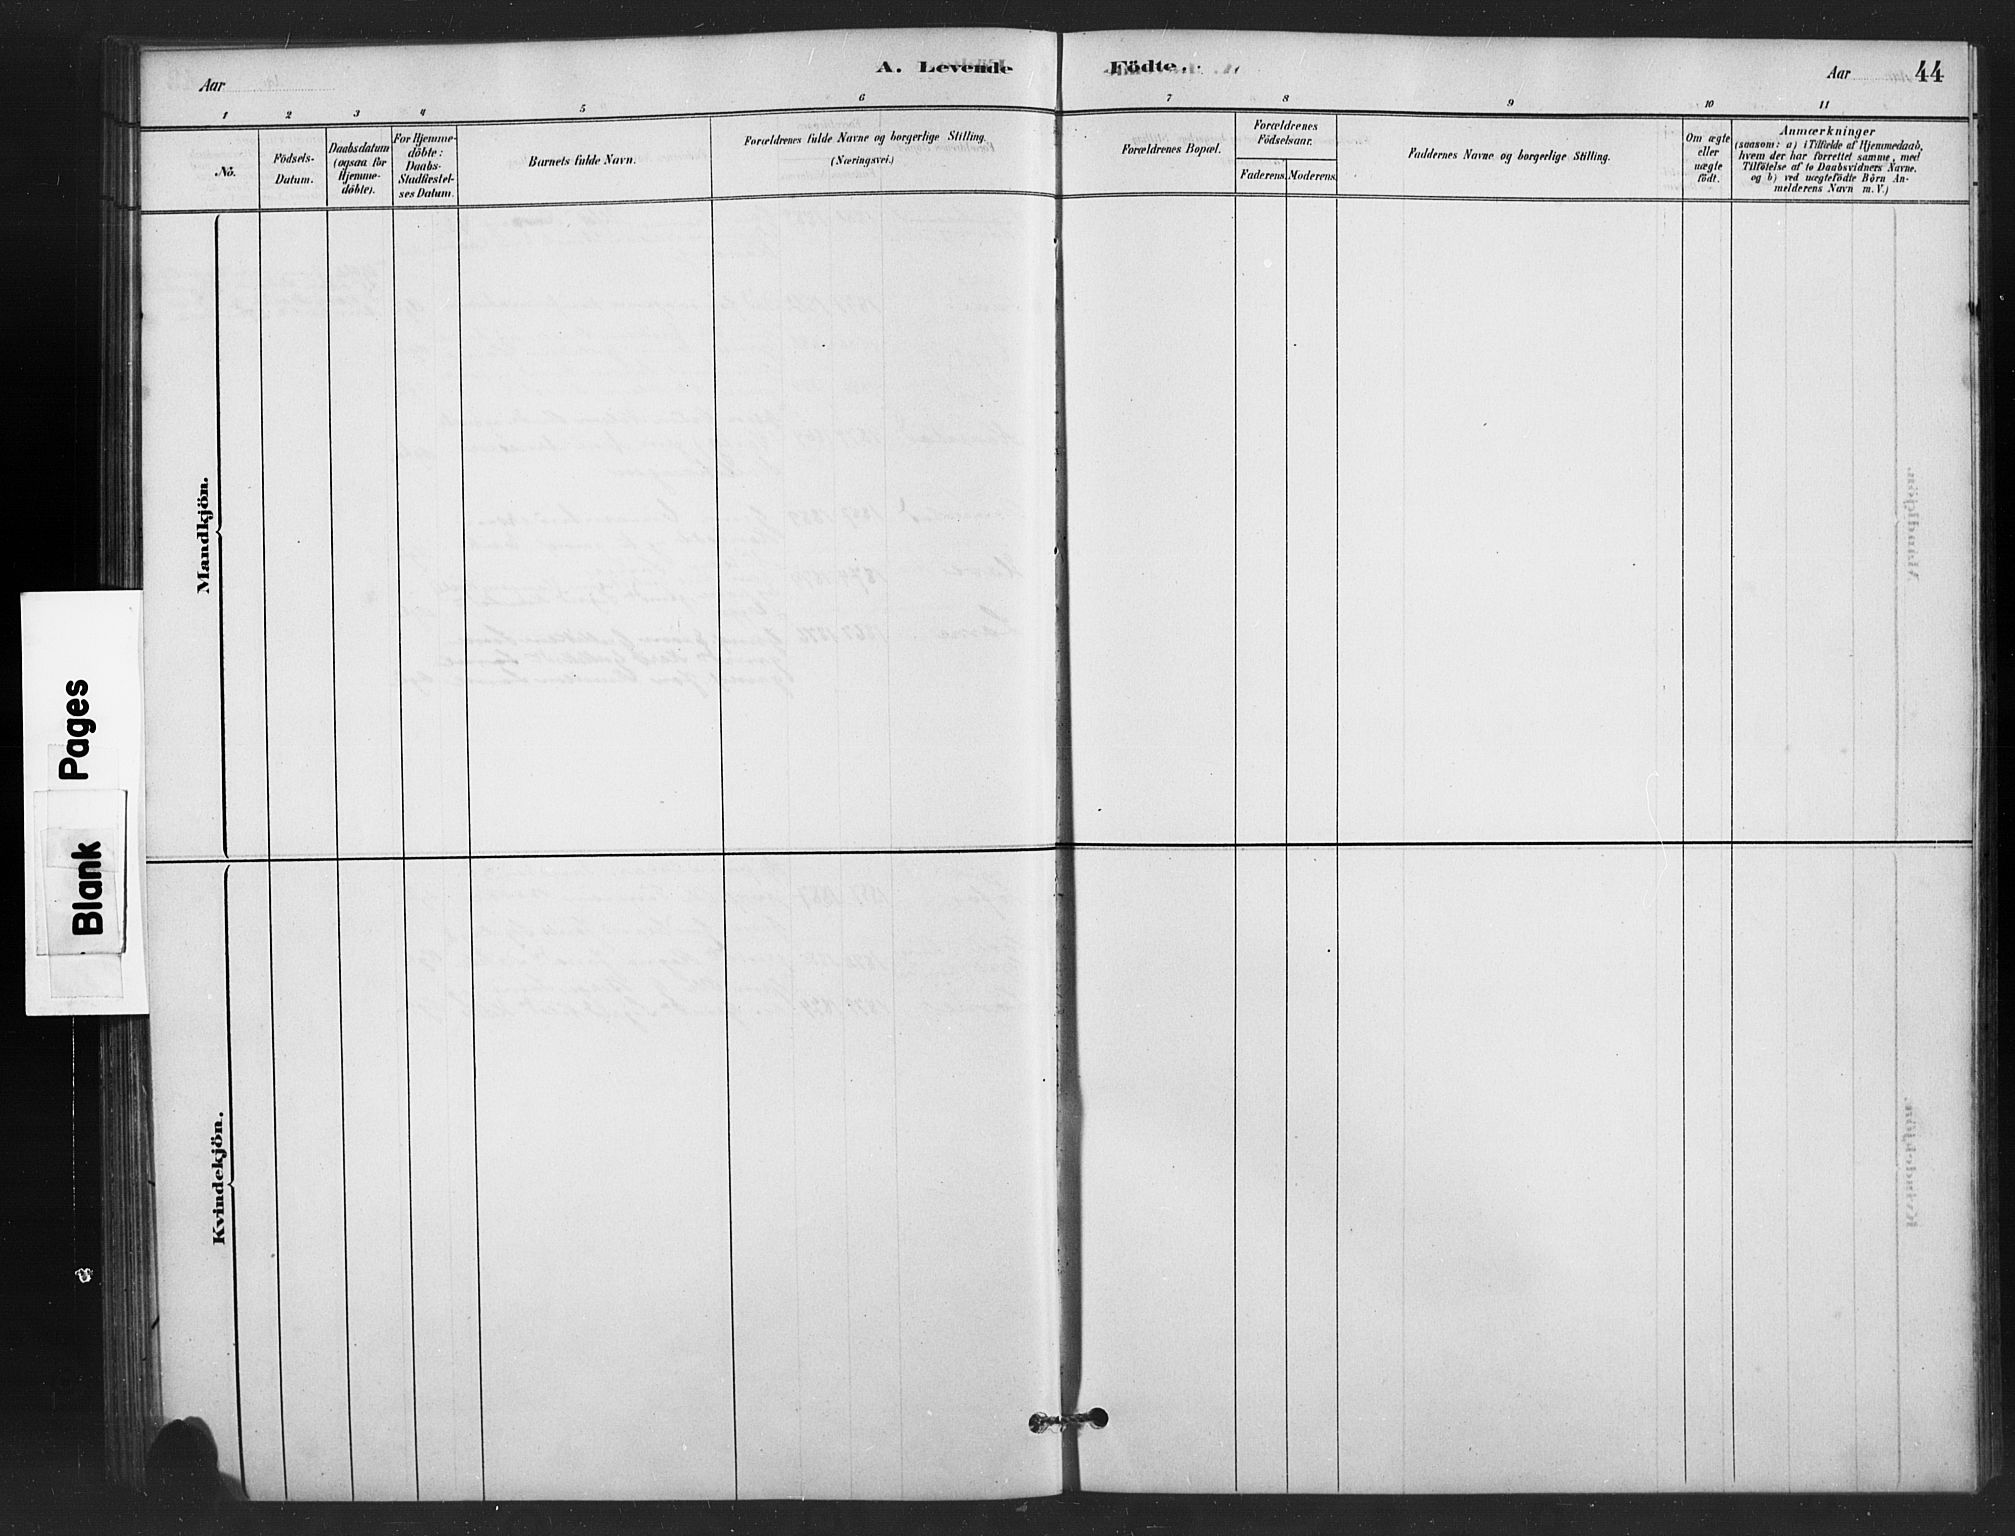 SAH, Vestre Slidre prestekontor, Klokkerbok nr. 6, 1881-1915, s. 44